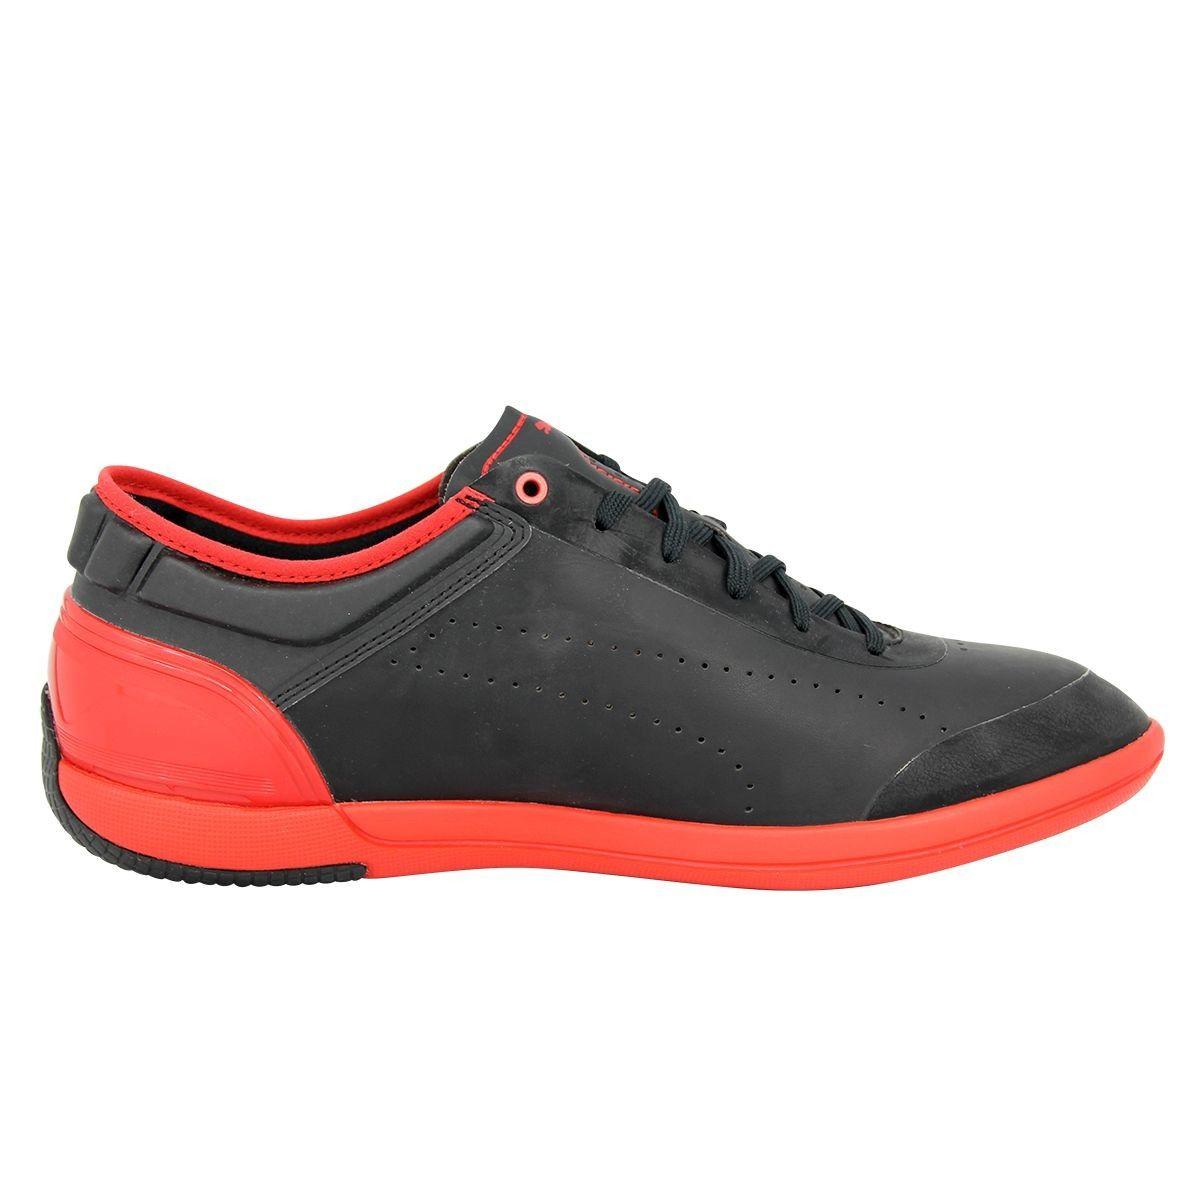 puma ferrari homme chaussure 44